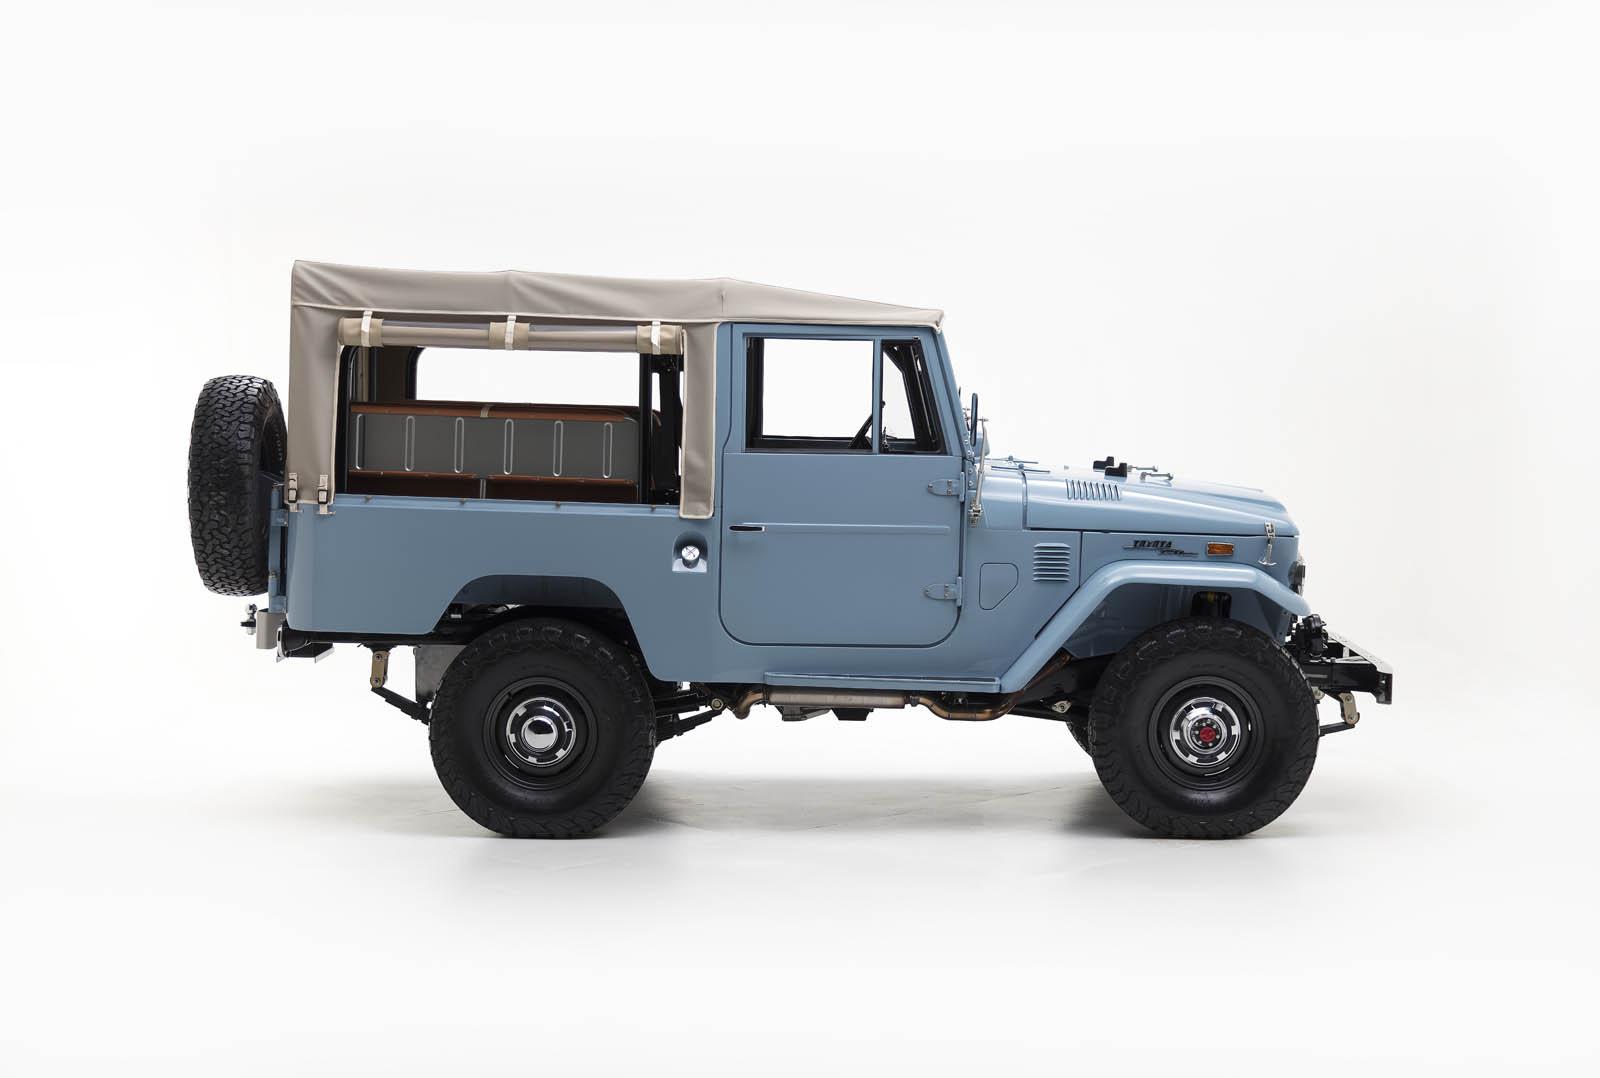 1982_Toyota_Land_Cruiser_FJ43_Aspen_Lifestyle_The_FJ_Company_10